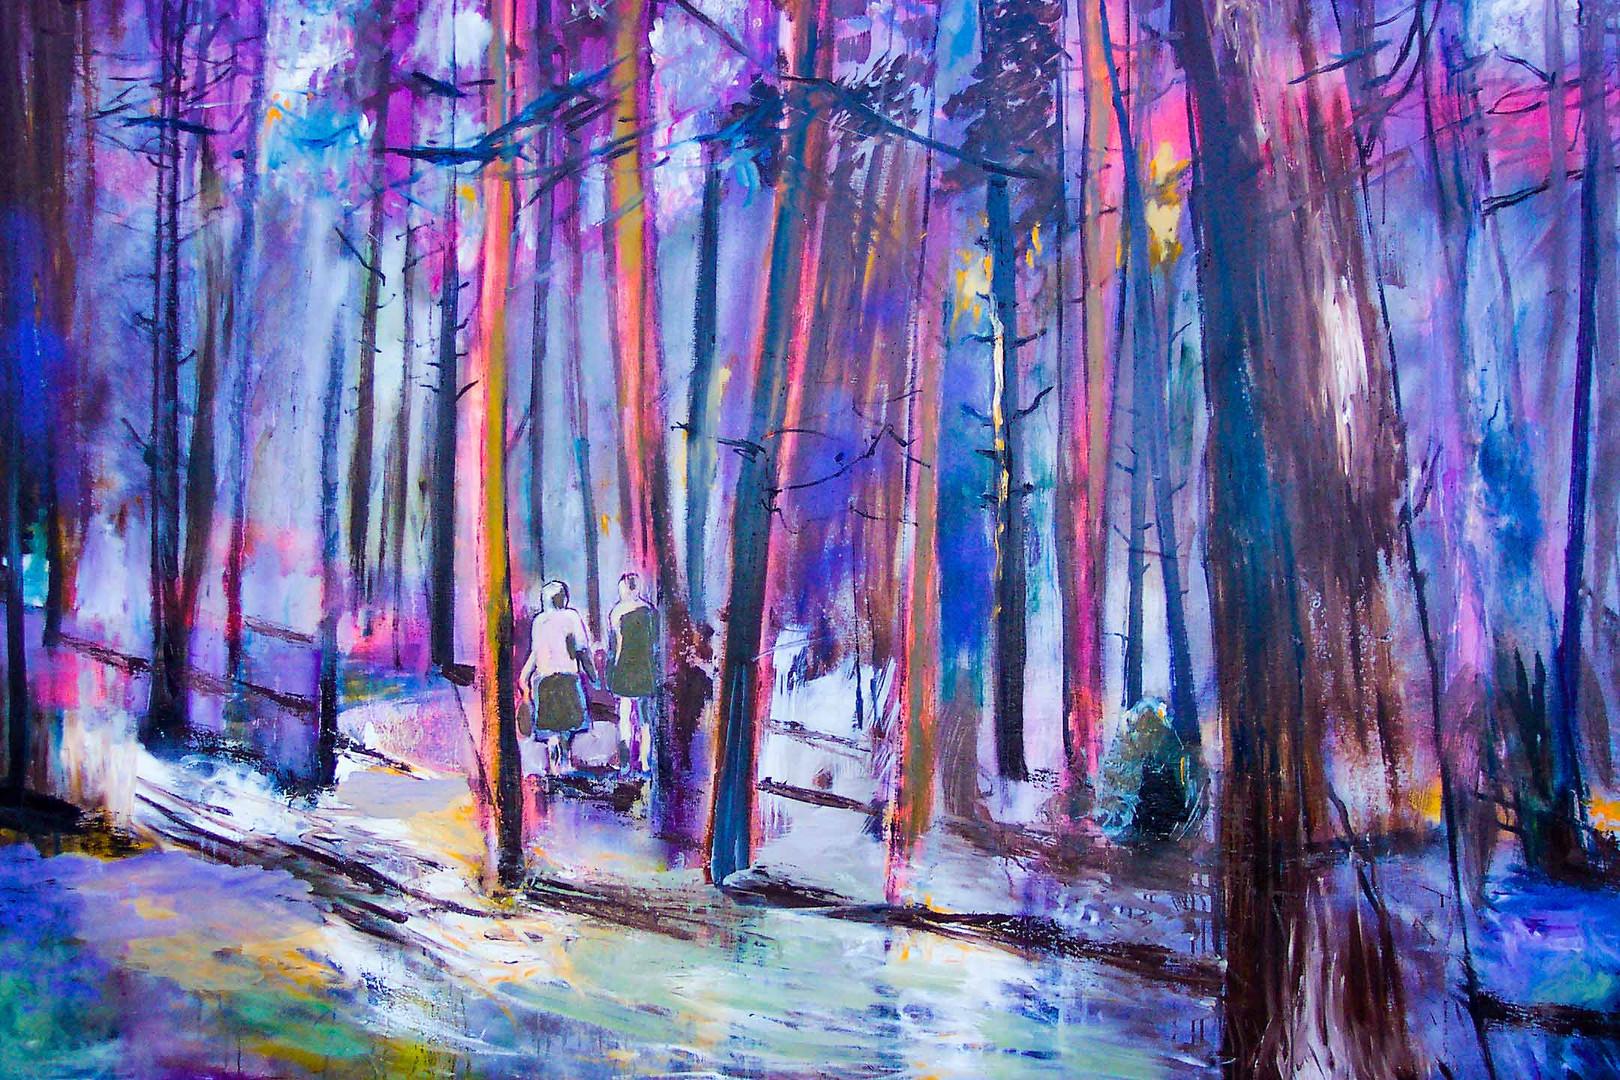 Samtal i skogen